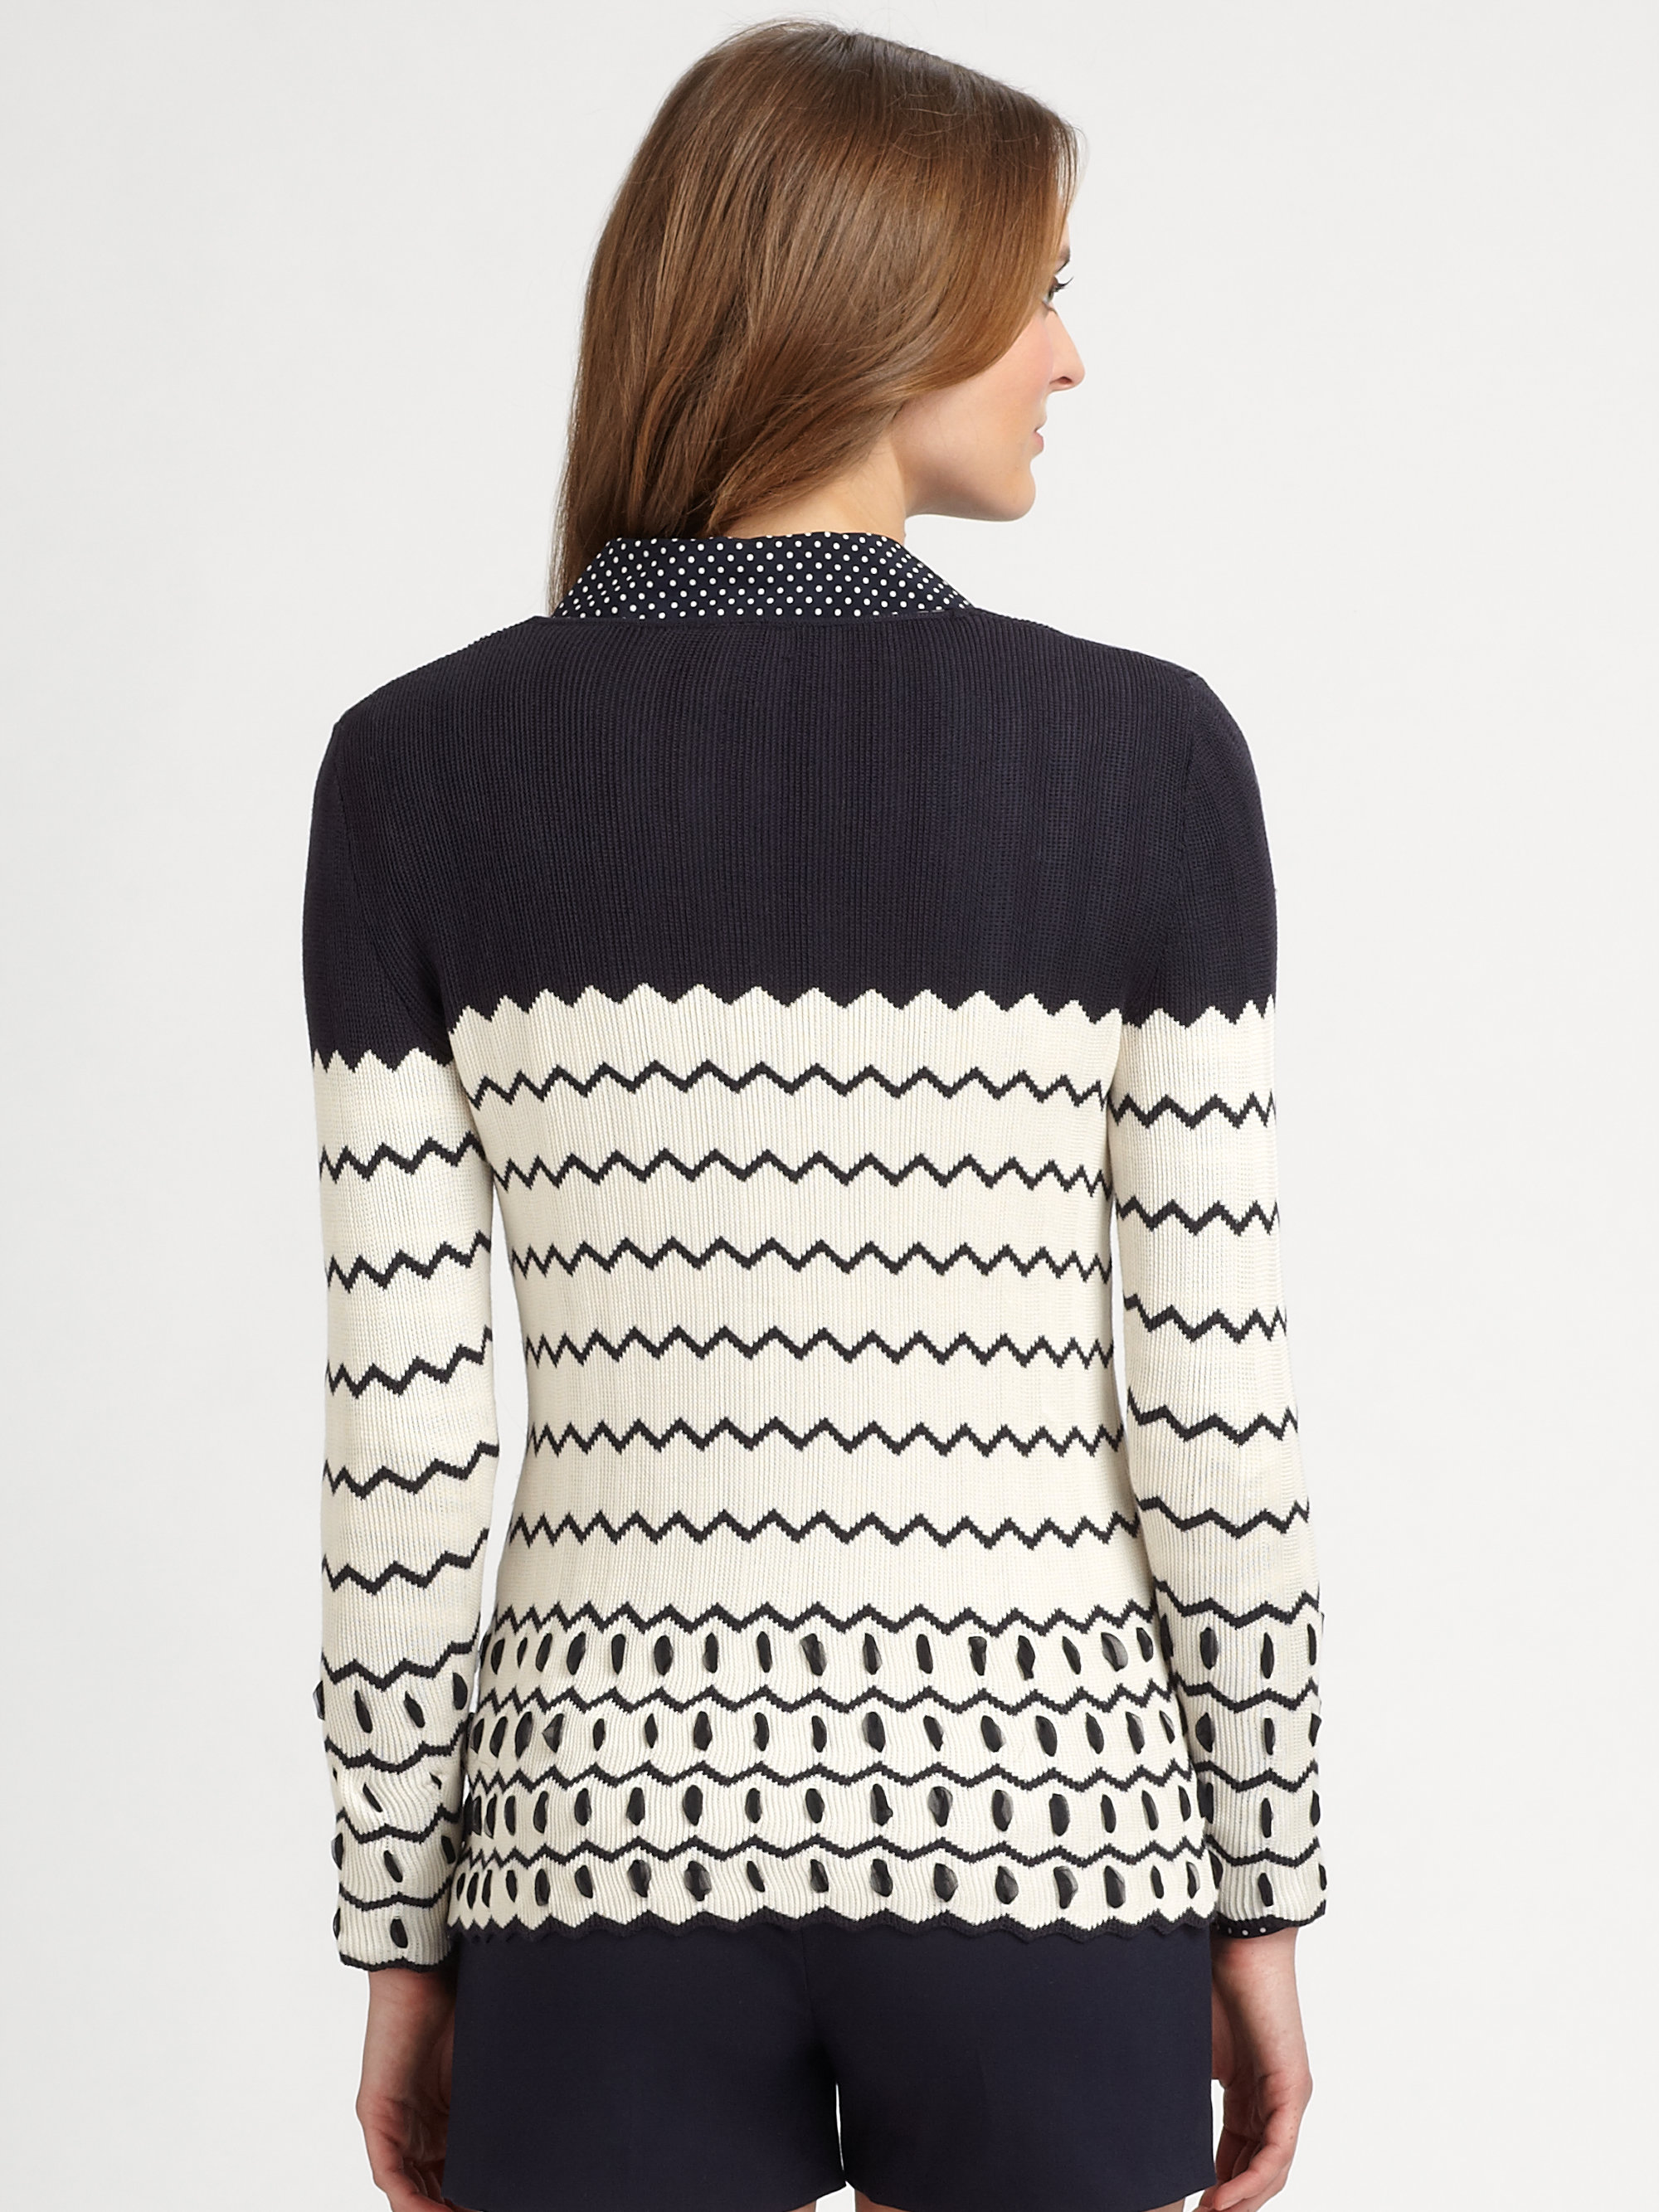 Tory burch Nicky Silk Cardigan Sweater in Blue | Lyst